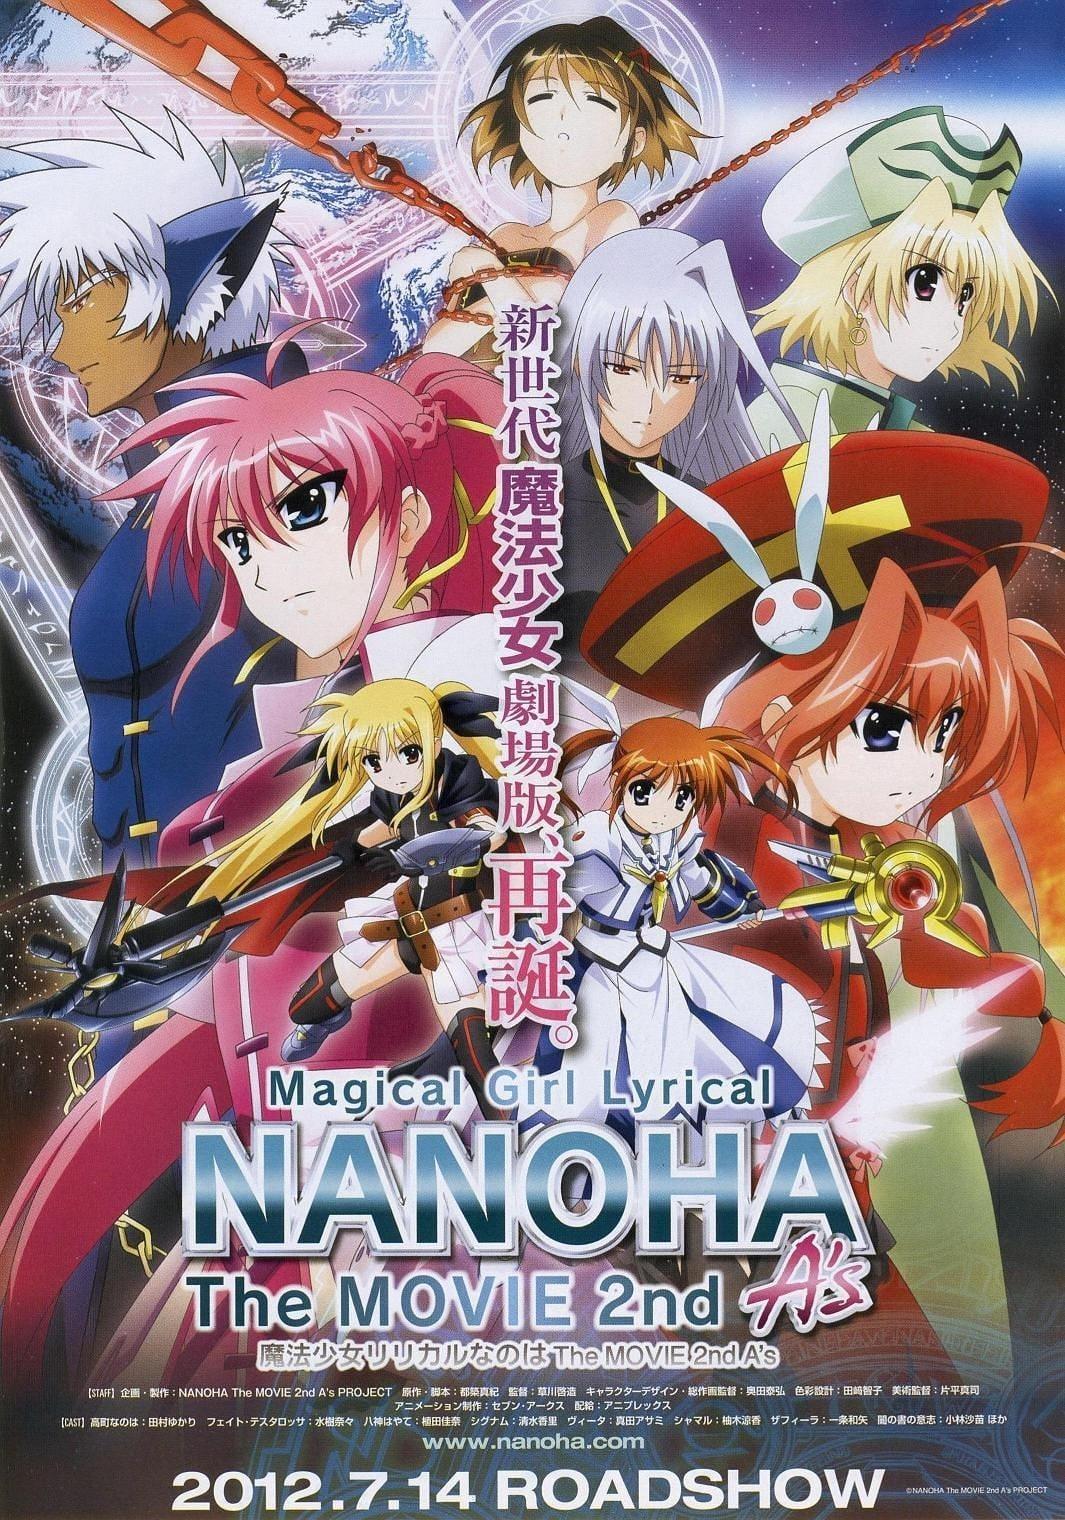 Magical Girl Lyrical Nanoha: The Movie 2nd A's (2012)